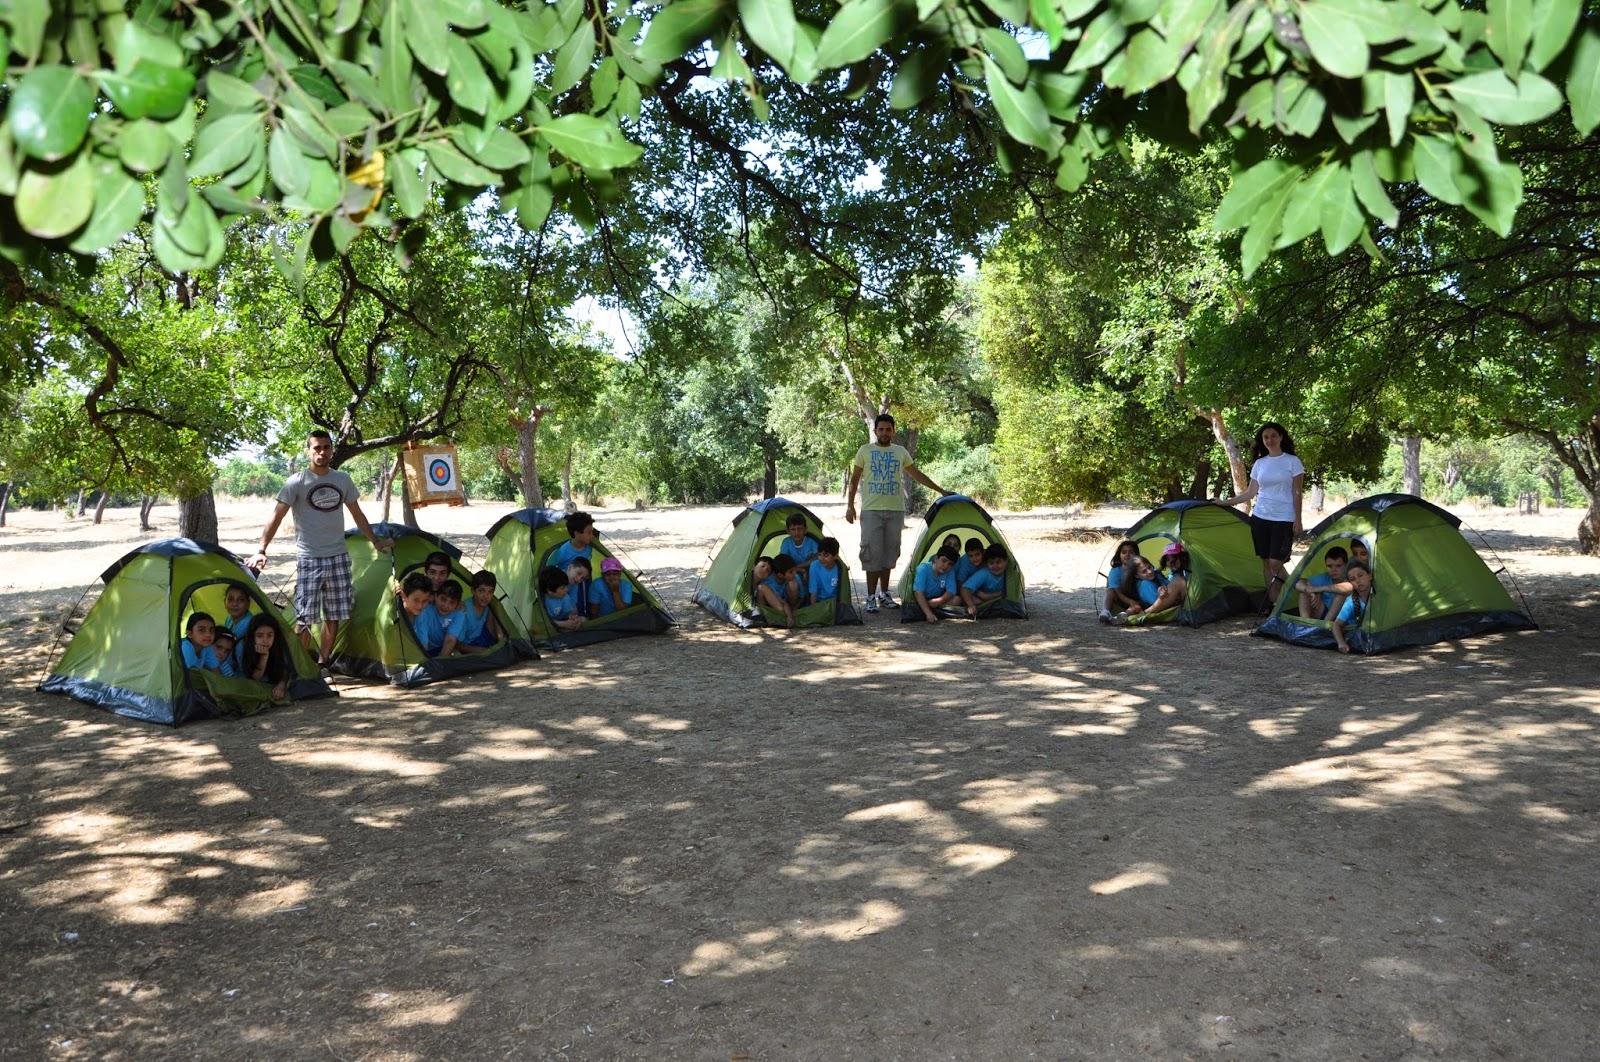 Aqua Kamp Gençlik Yaz Kampları 2015 19